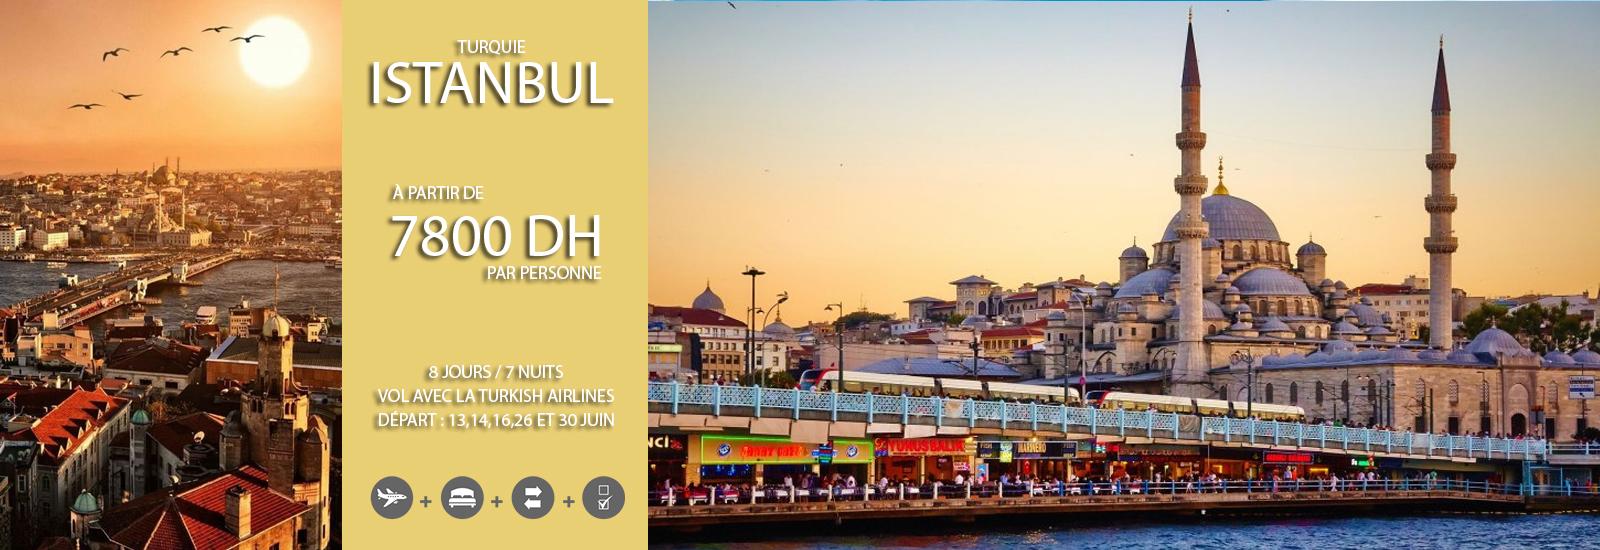 voyage-organisé-maroc-turquie-pas-cher-istanbul-juin-2018